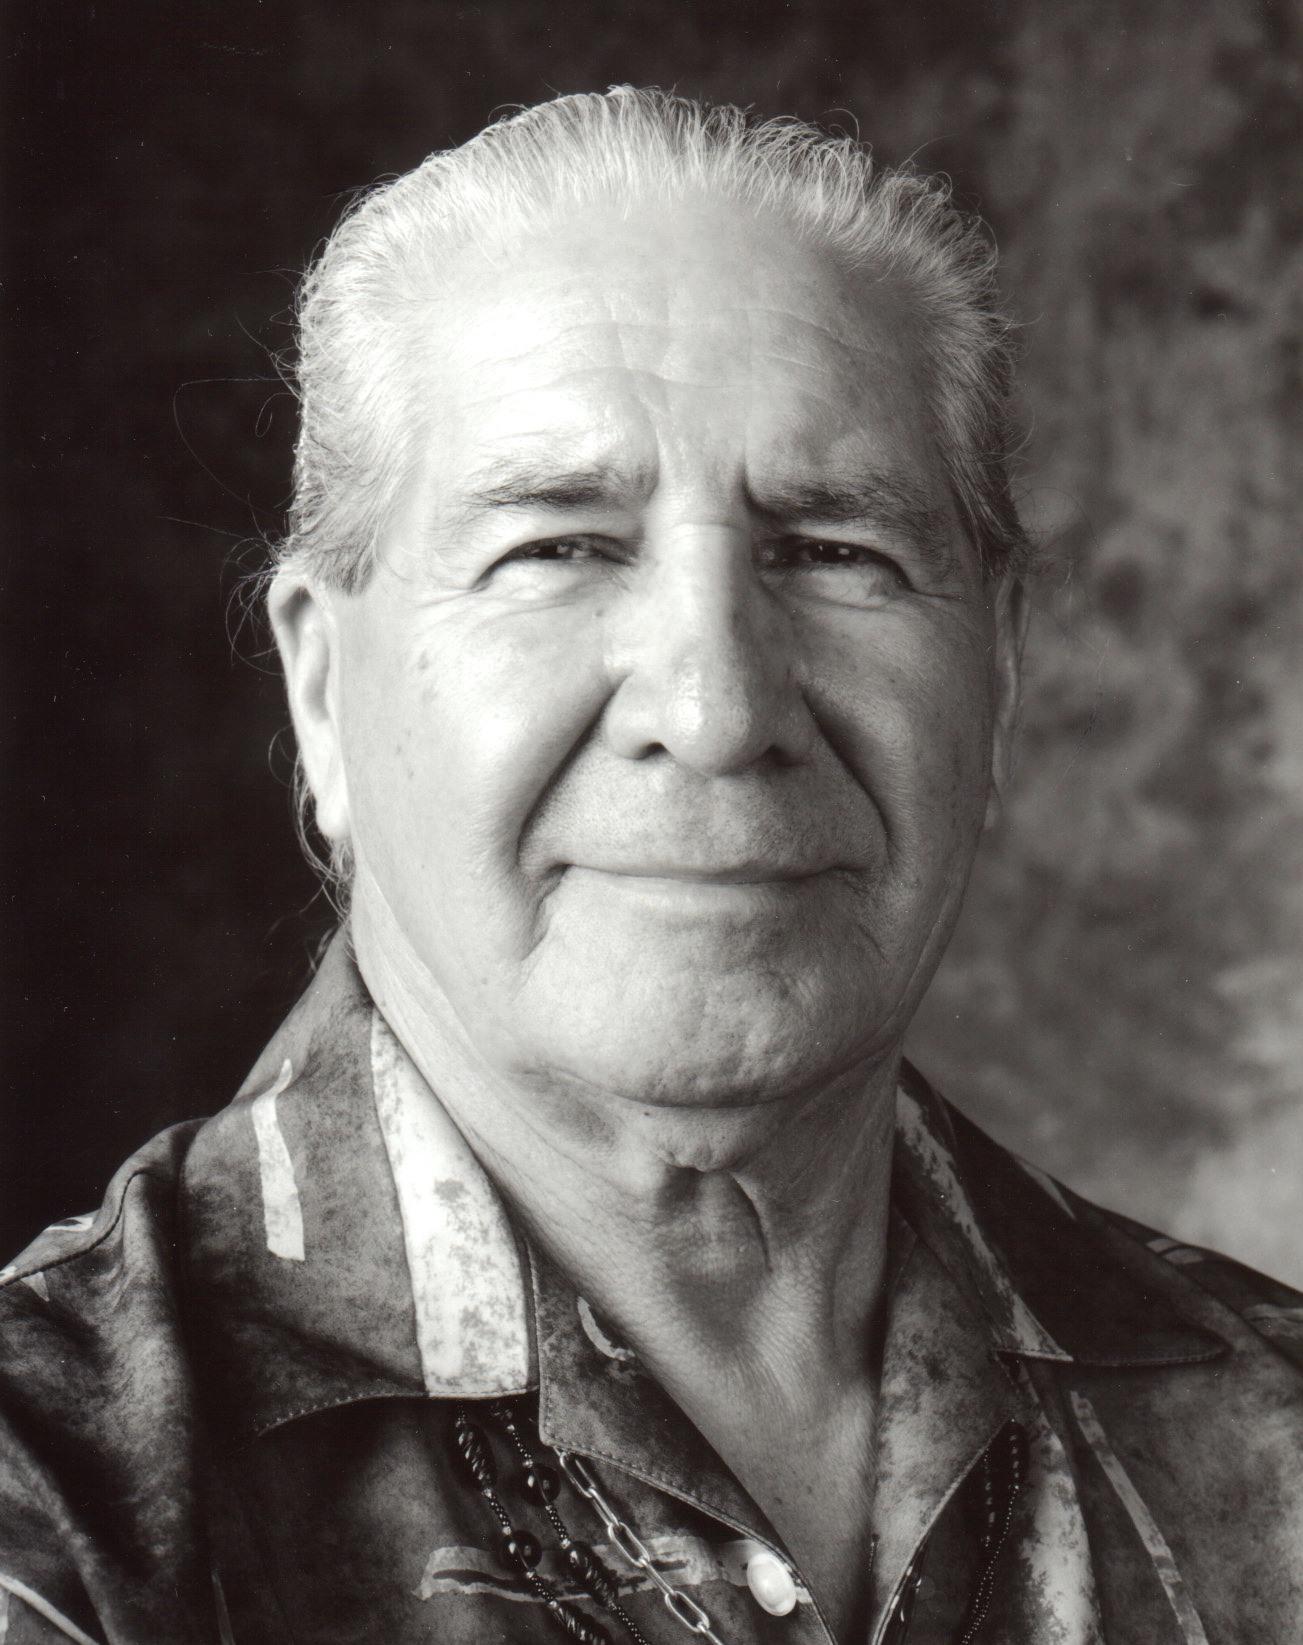 Chief Oren Lyons